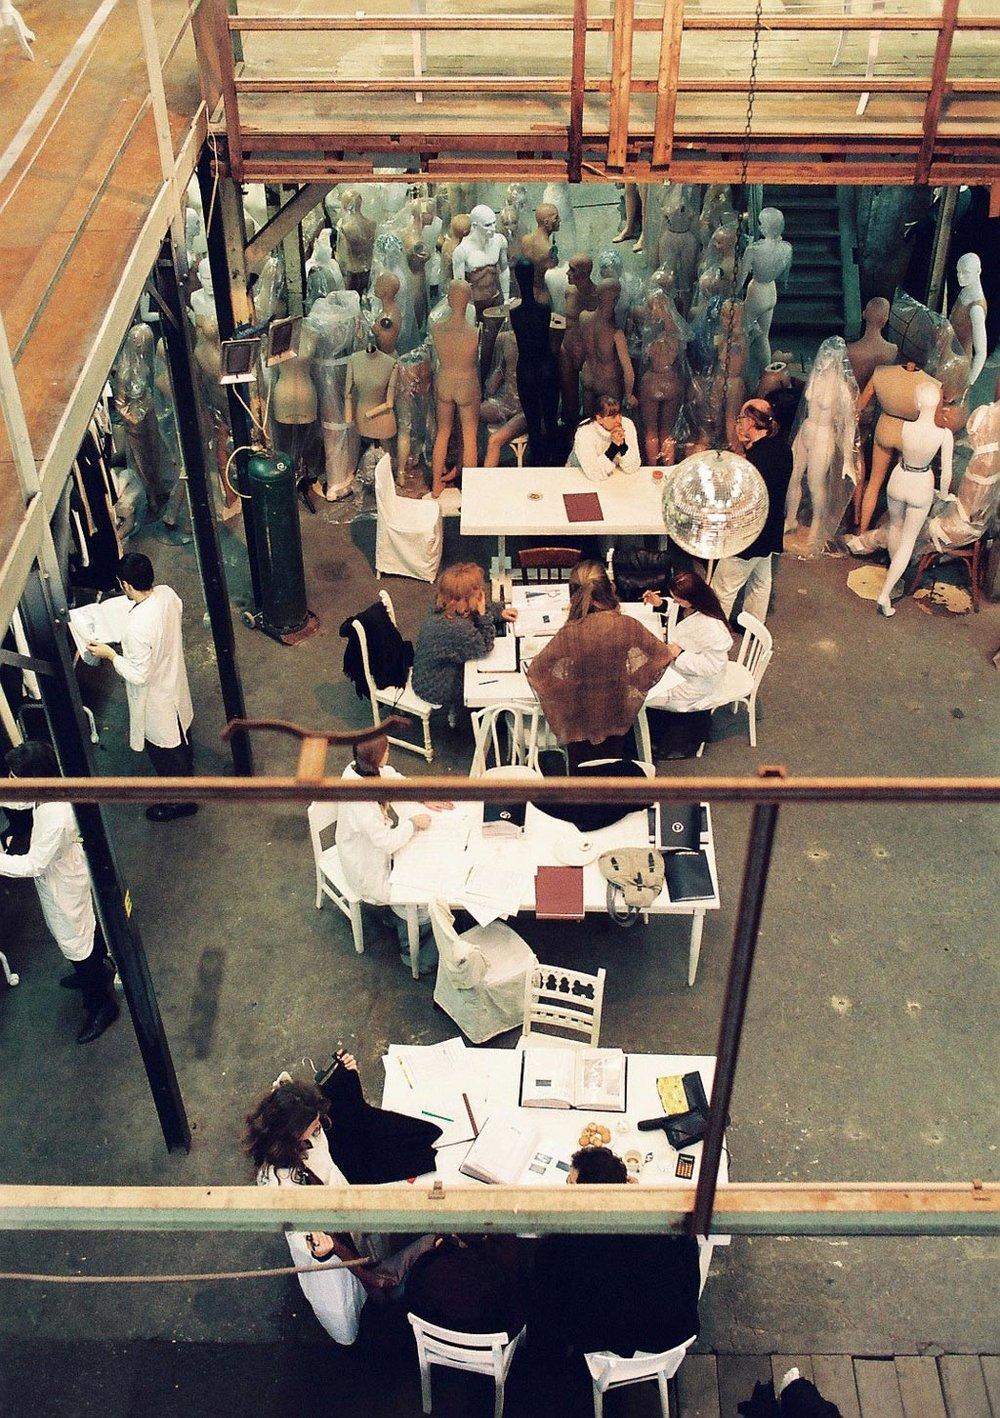 Maison Martin Margiela showroom (image: Anders Edström)